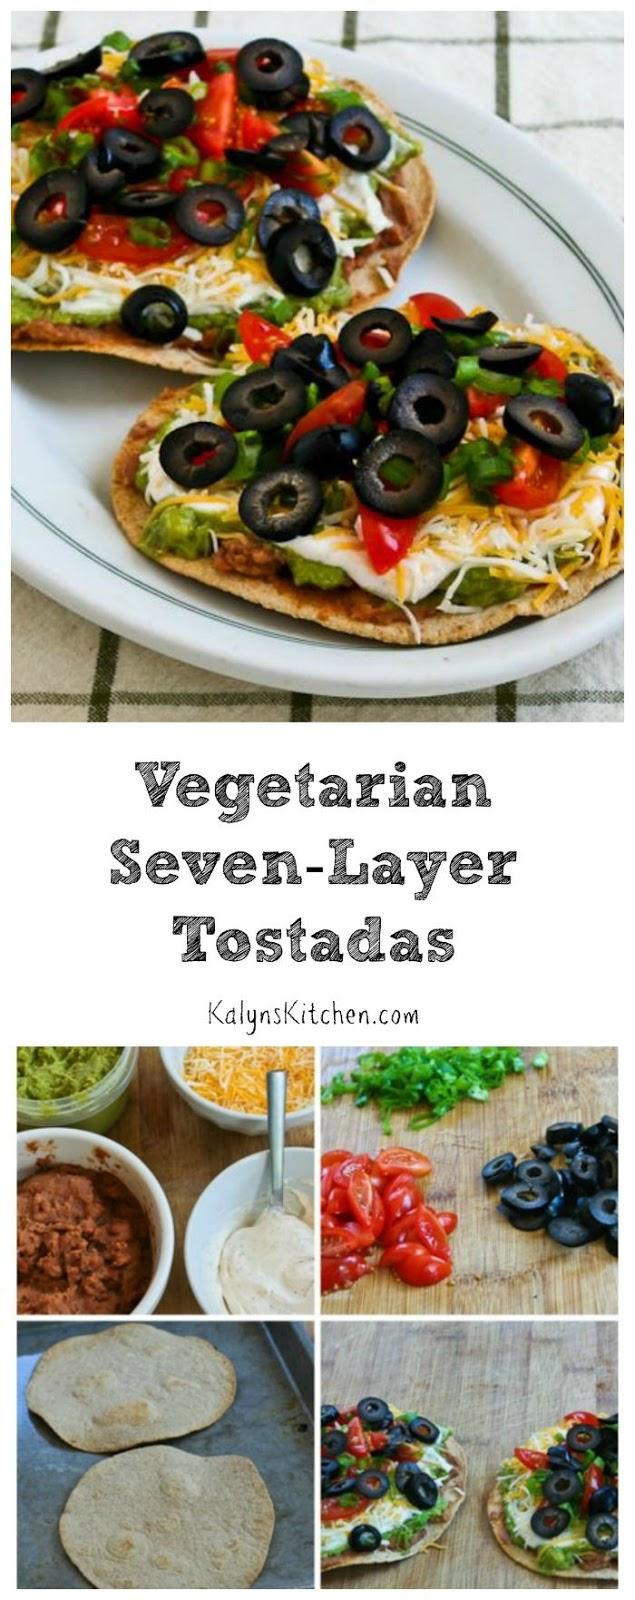 Vegetarian Seven-Layer Tostadas [from KalynsKitchen.com]